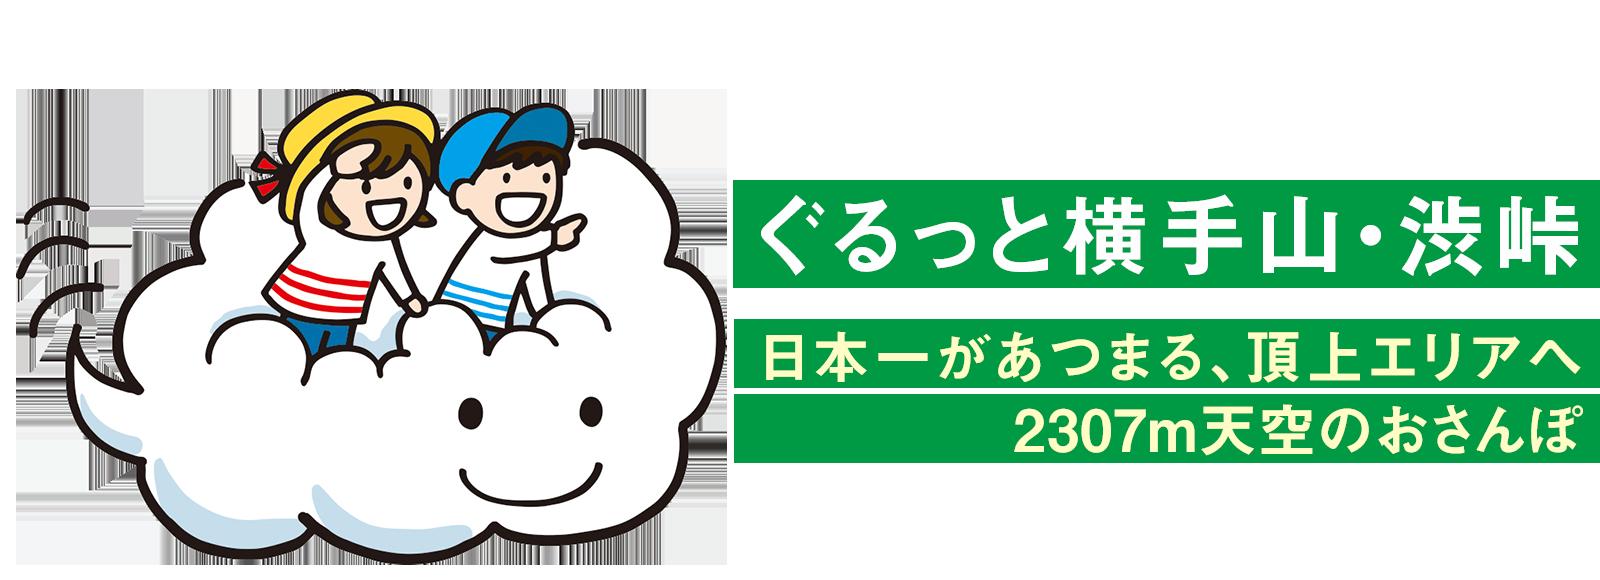 2307m天空のおさんぽ ぐるっと横手山・渋峠